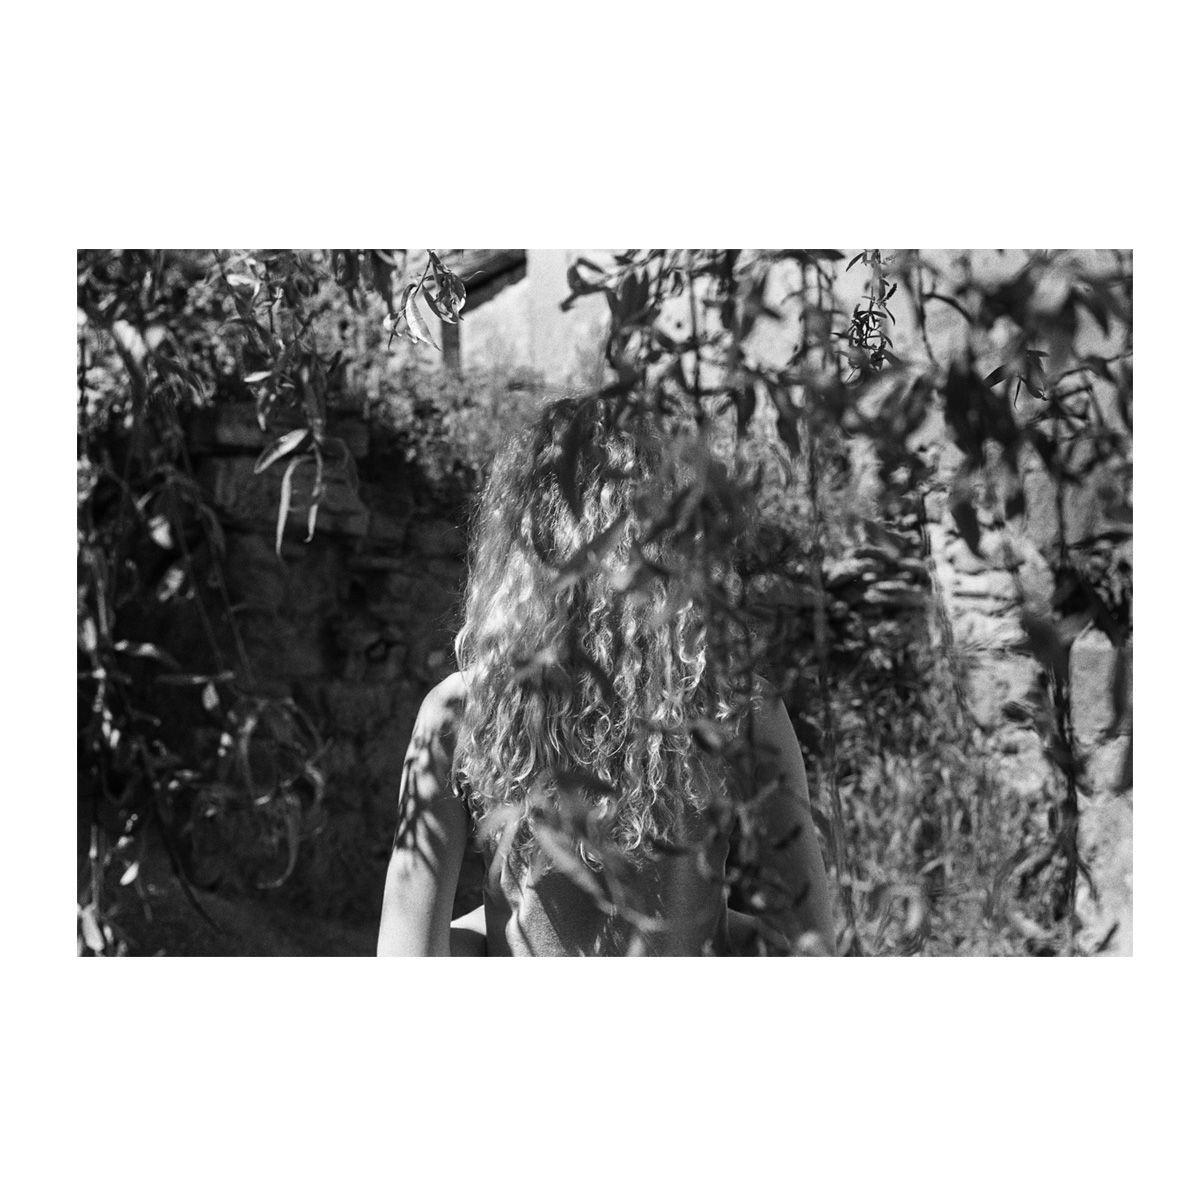 01-Alvaro_gomez_limbo